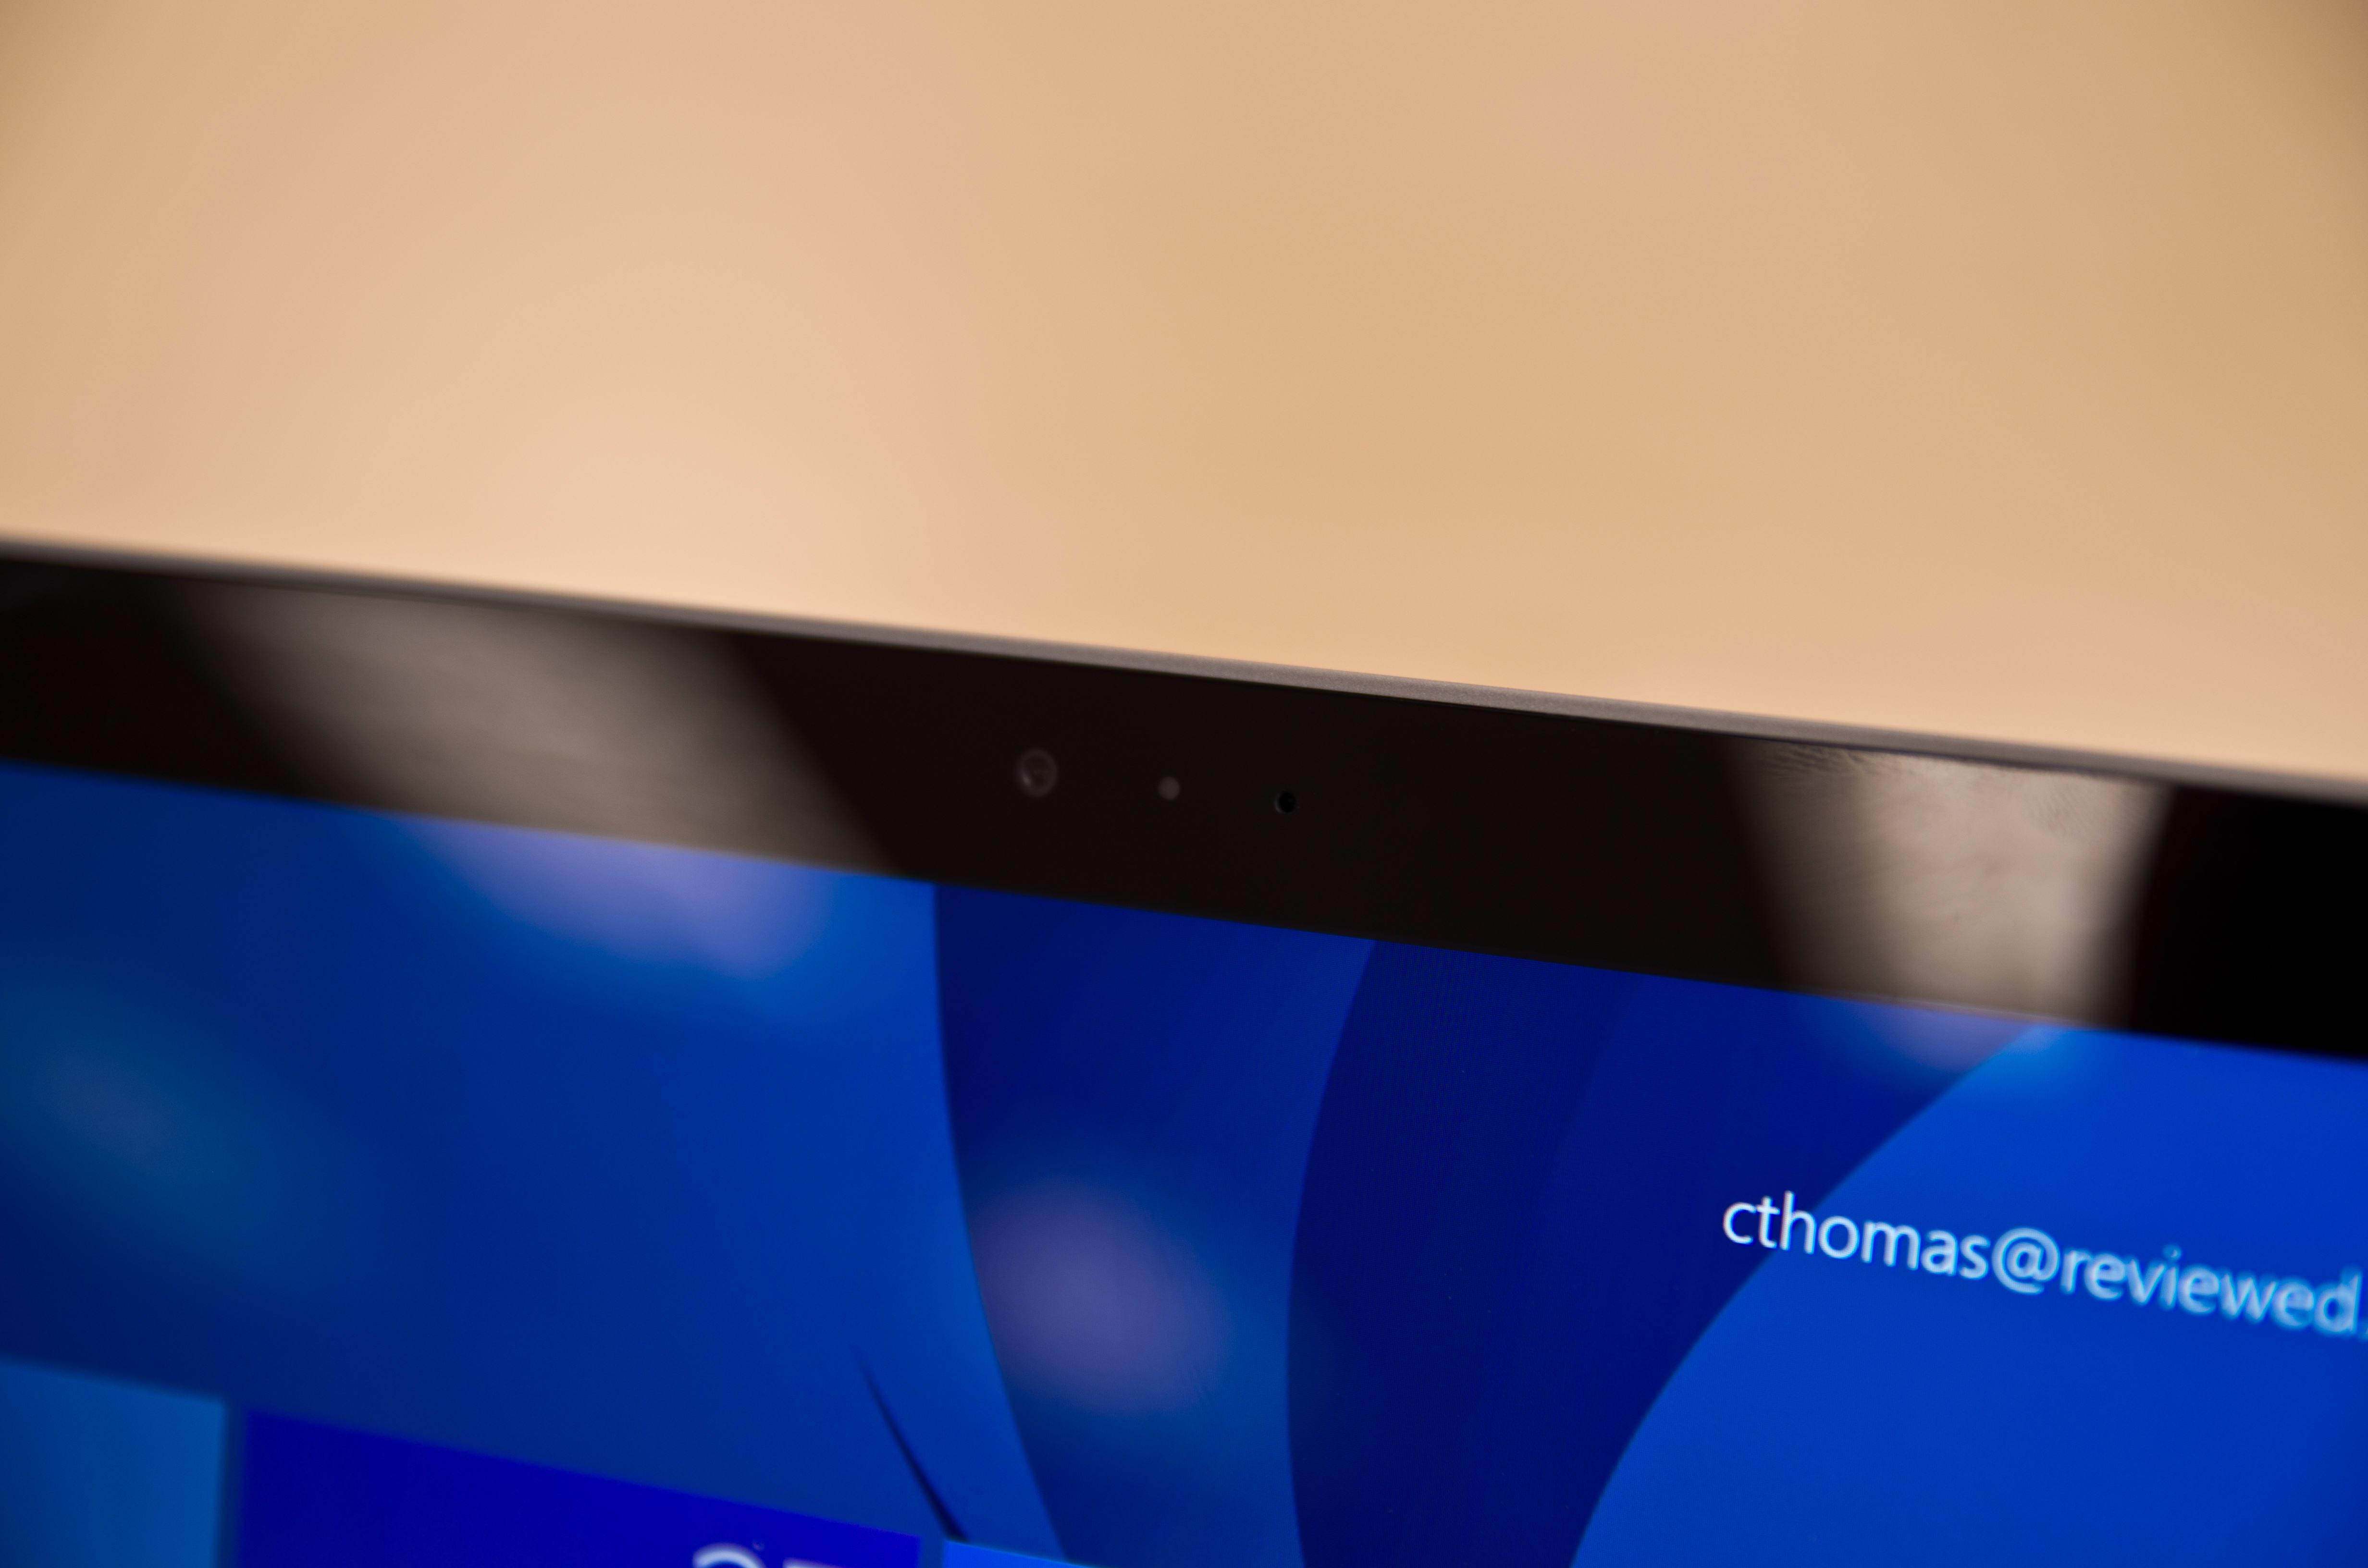 A closer look at the Microsoft Surface Pro 3's user-facing camera.